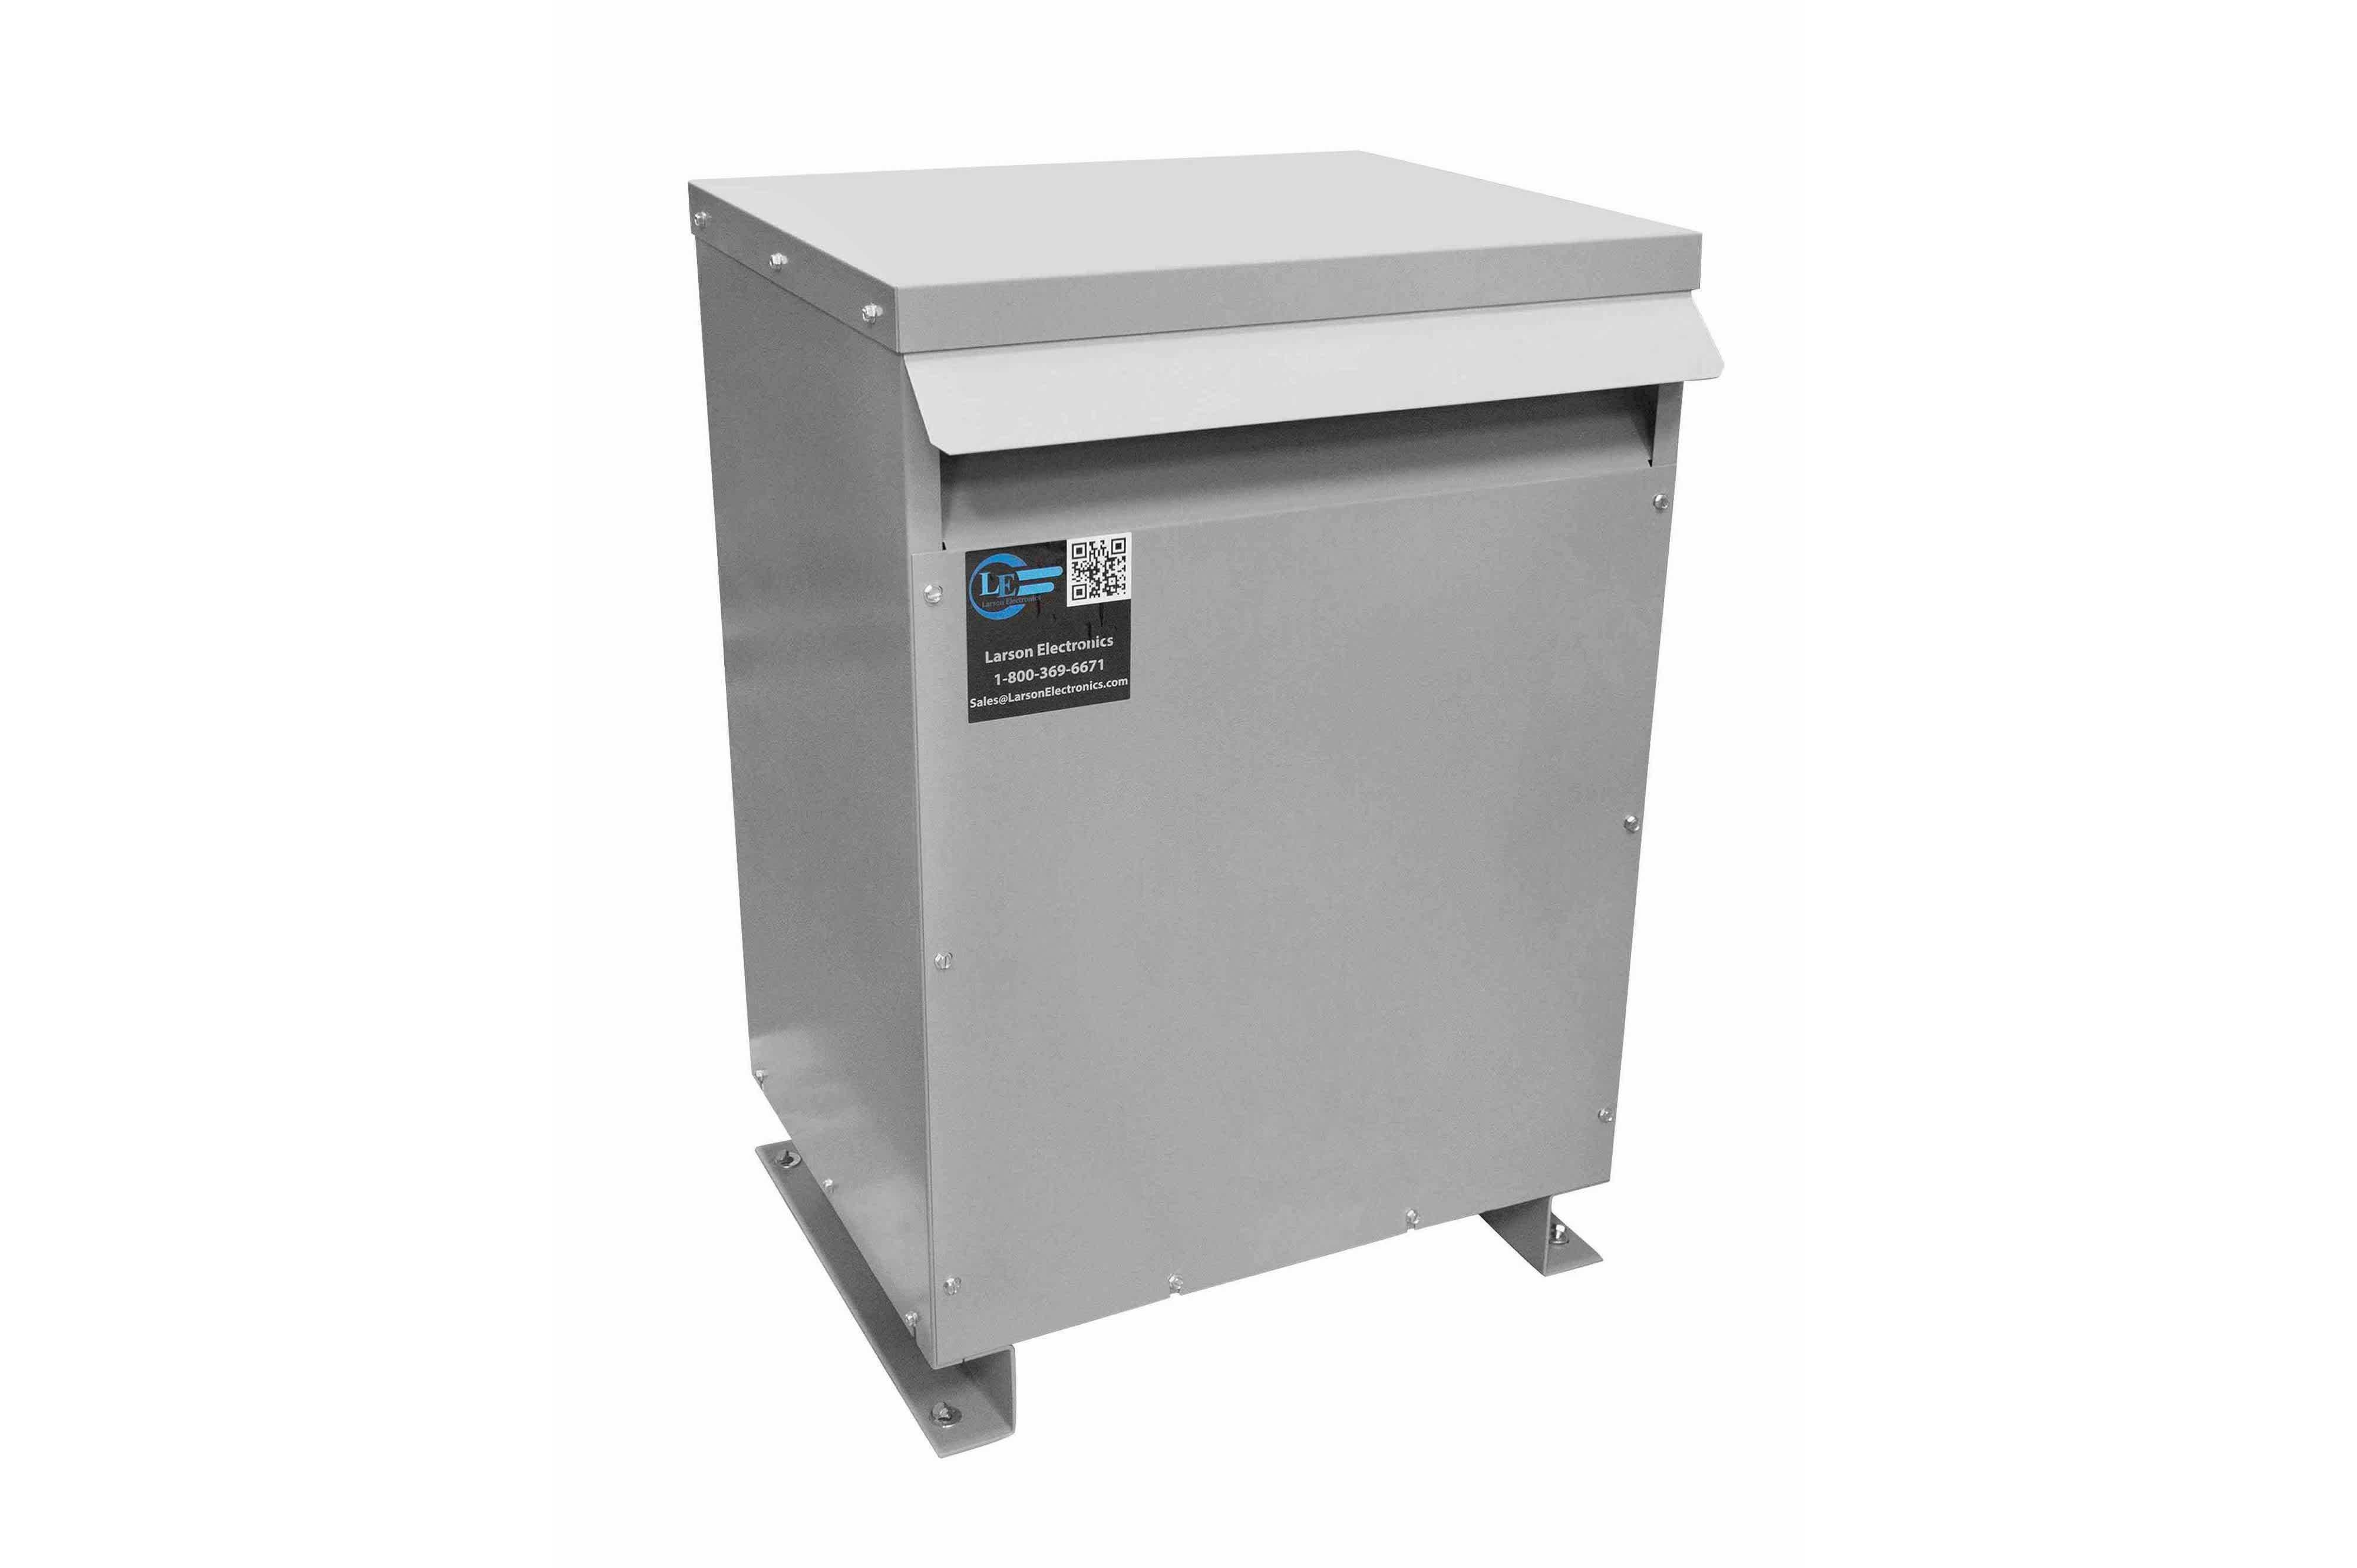 70 kVA 3PH Isolation Transformer, 575V Wye Primary, 480V Delta Secondary, N3R, Ventilated, 60 Hz